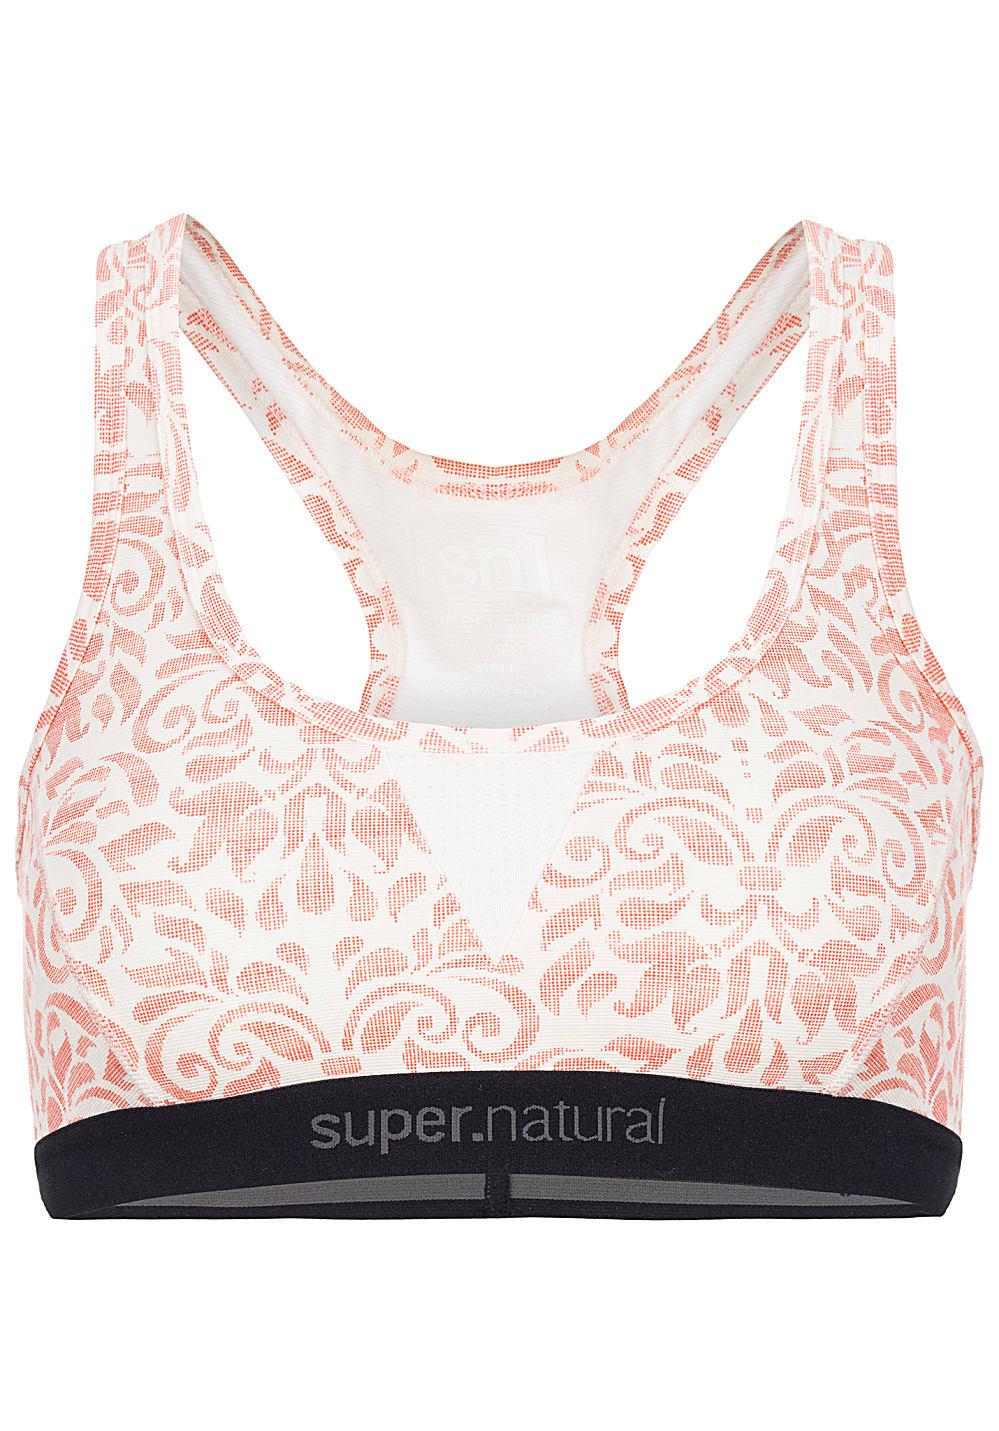 super-natural-semplice-260-printed-soutien-gorge-femmes-oranges